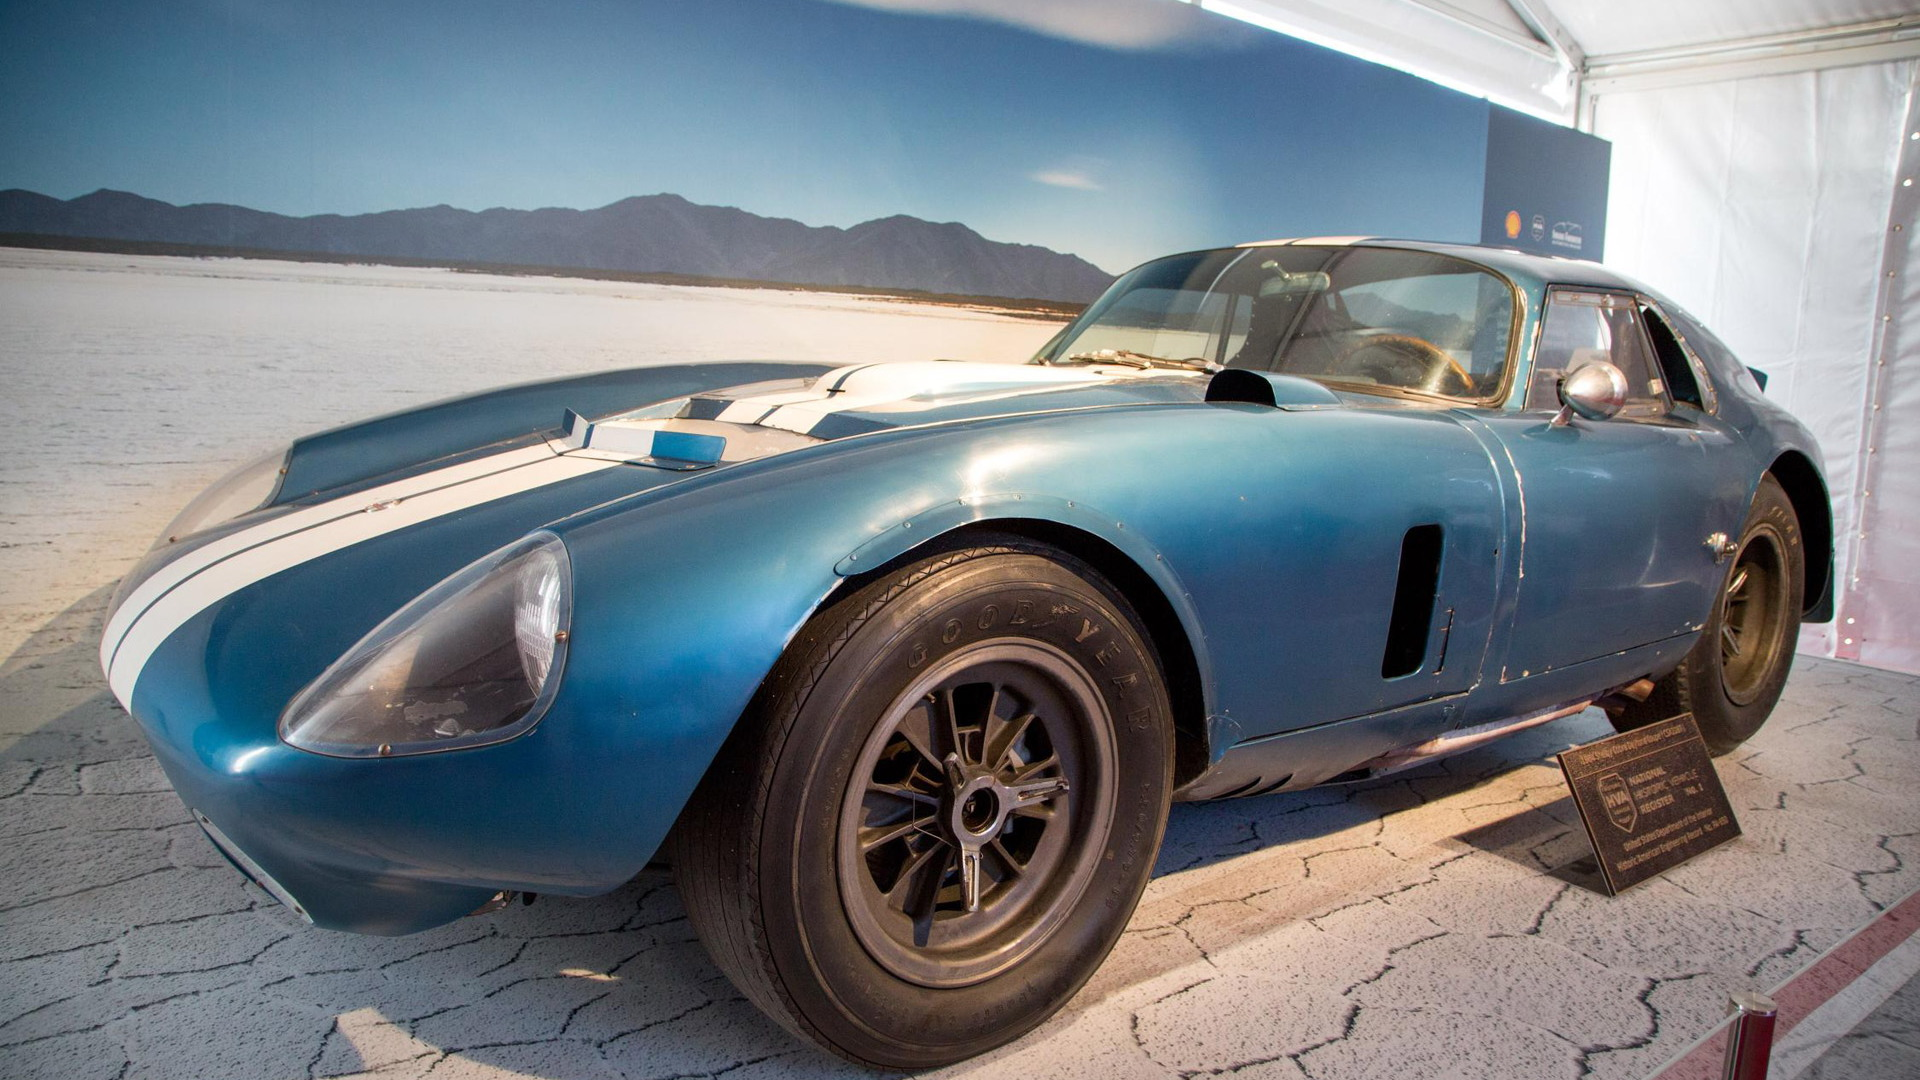 1964 Shelby Cobra Daytona Coupe (chassis #CSX2287)